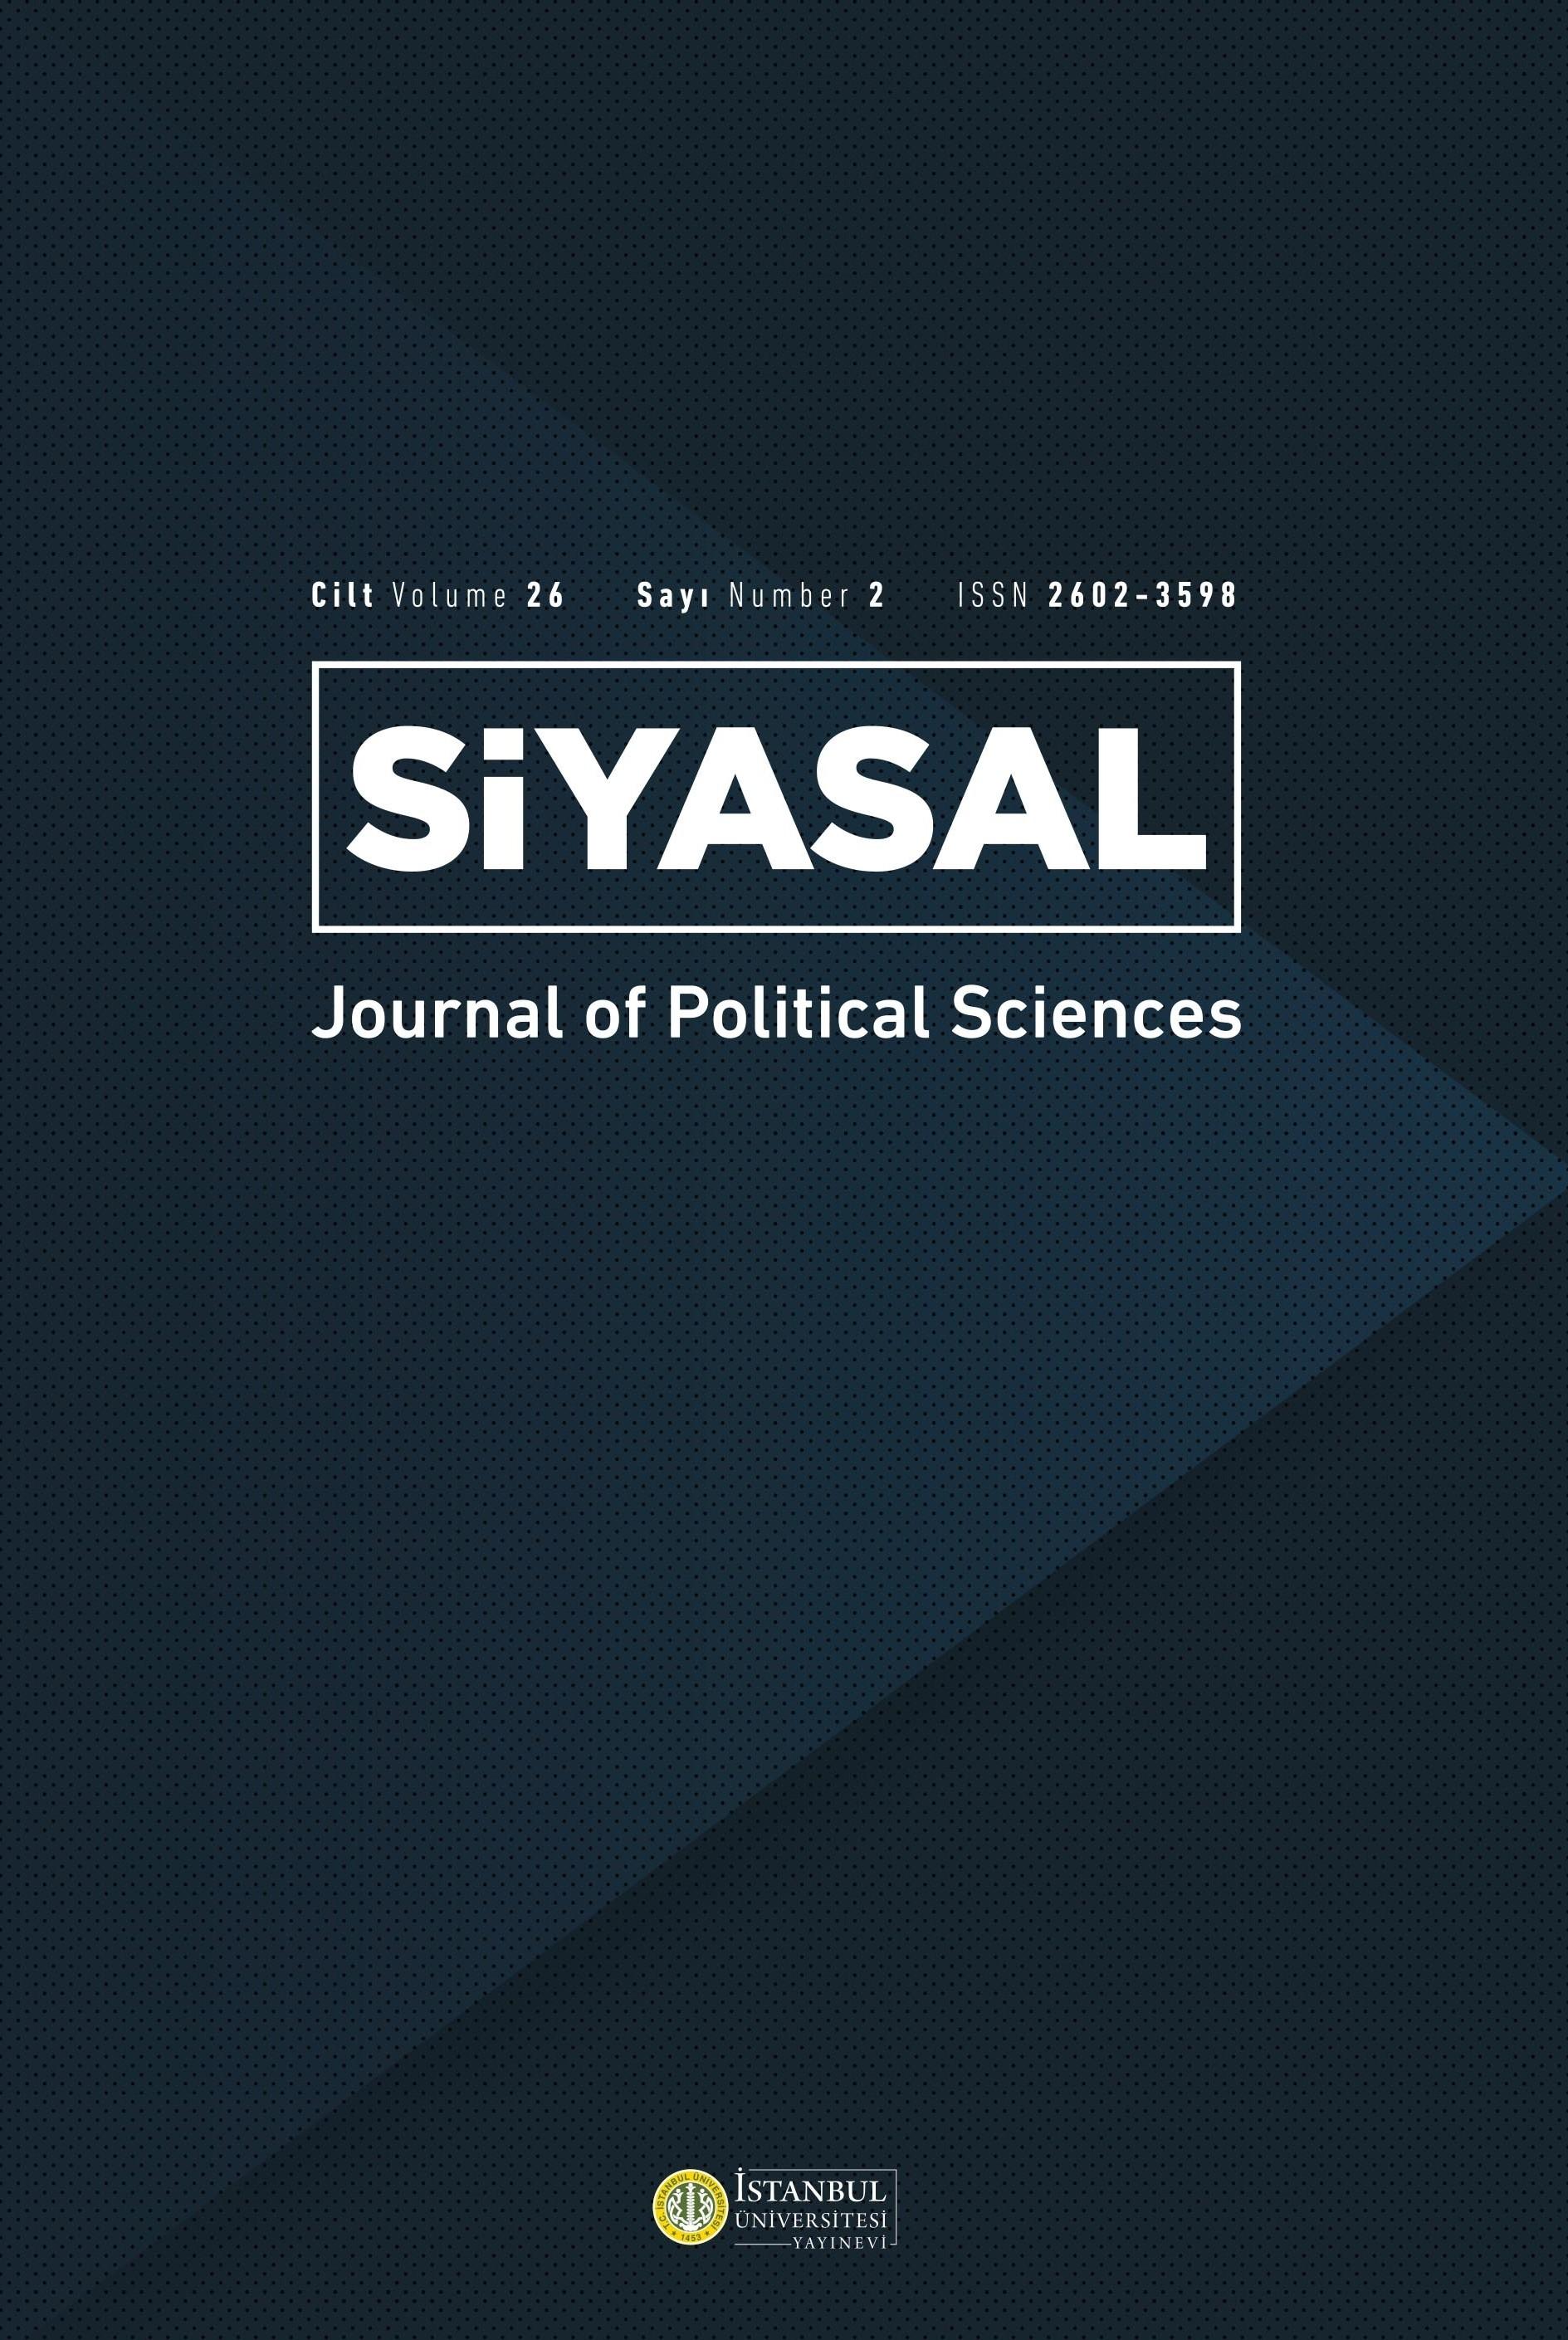 SİYASAL / Journal of Political Sciences